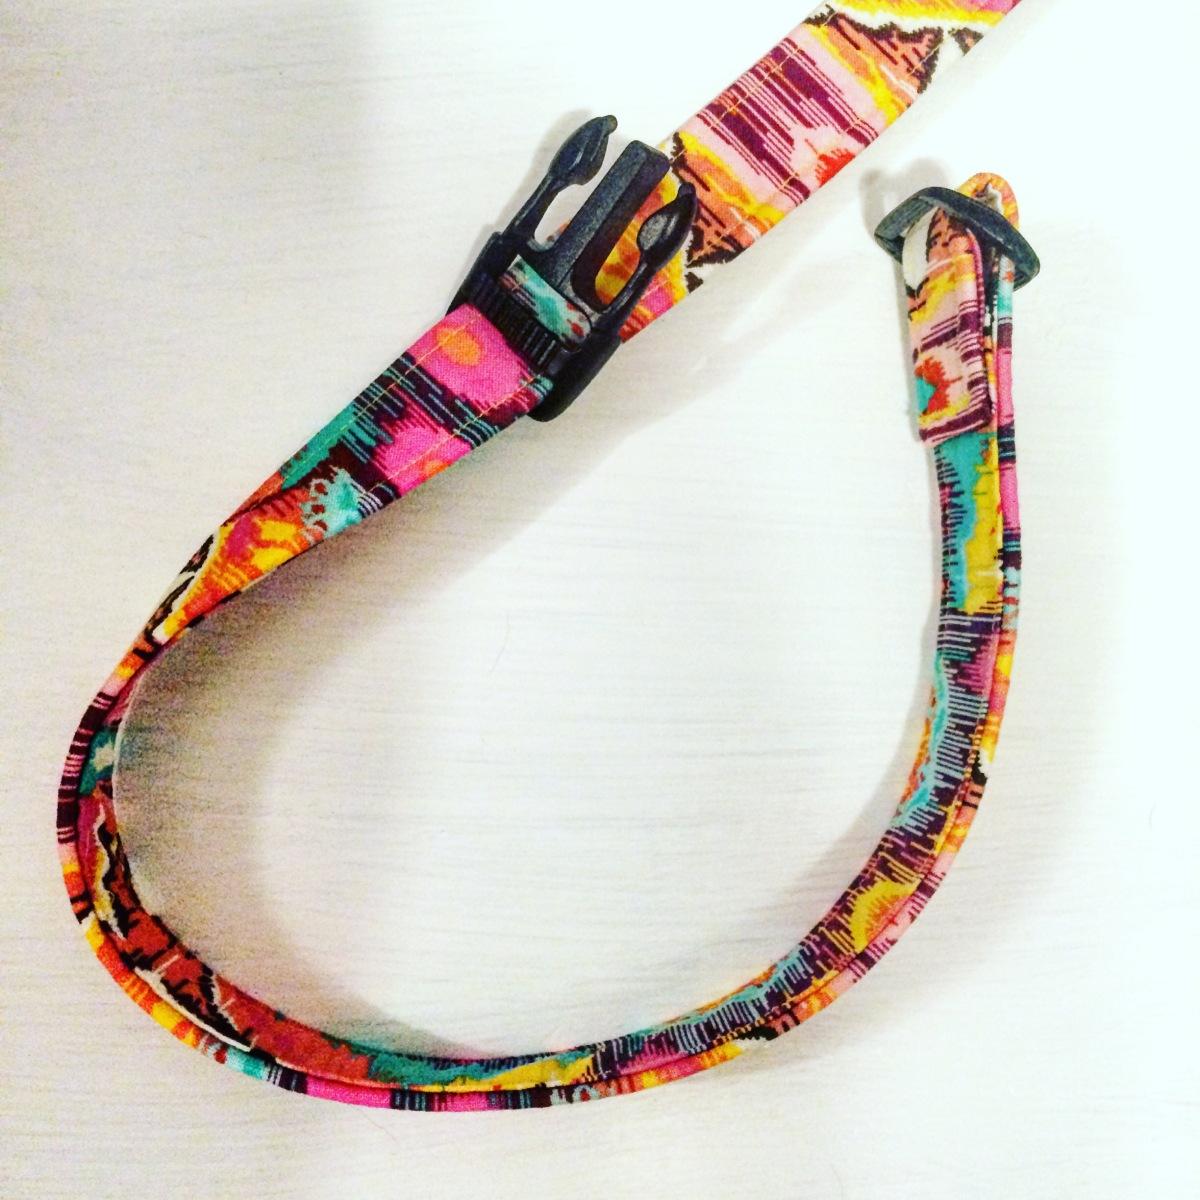 DIY Homemade Adjustable Fabric Dog Collar Tutorial